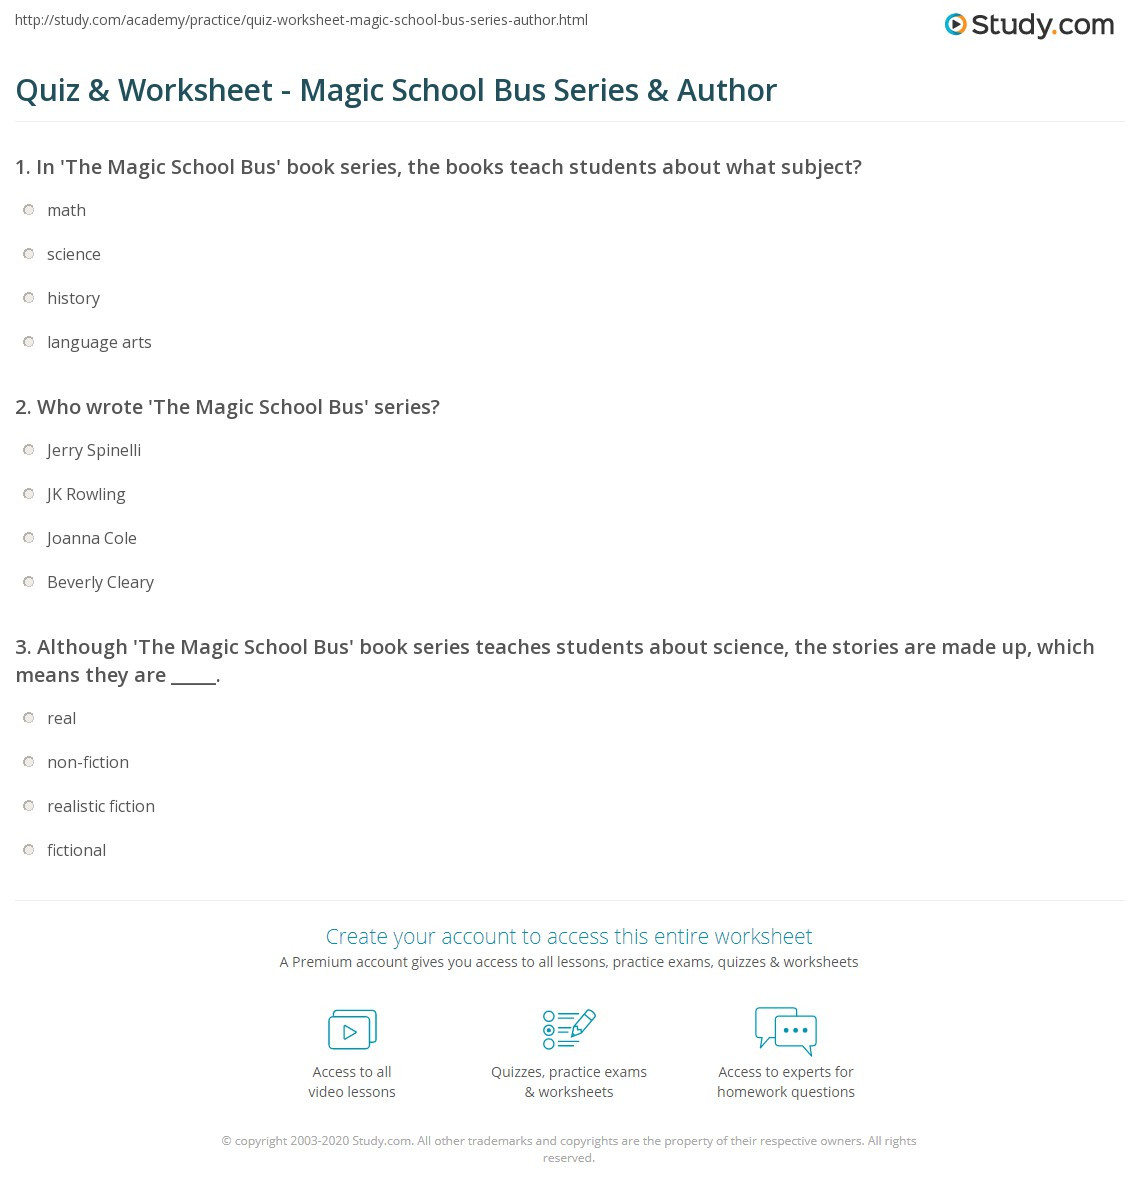 Magic School Bus Worksheet Quiz & Worksheet Magic School Bus Series & Author